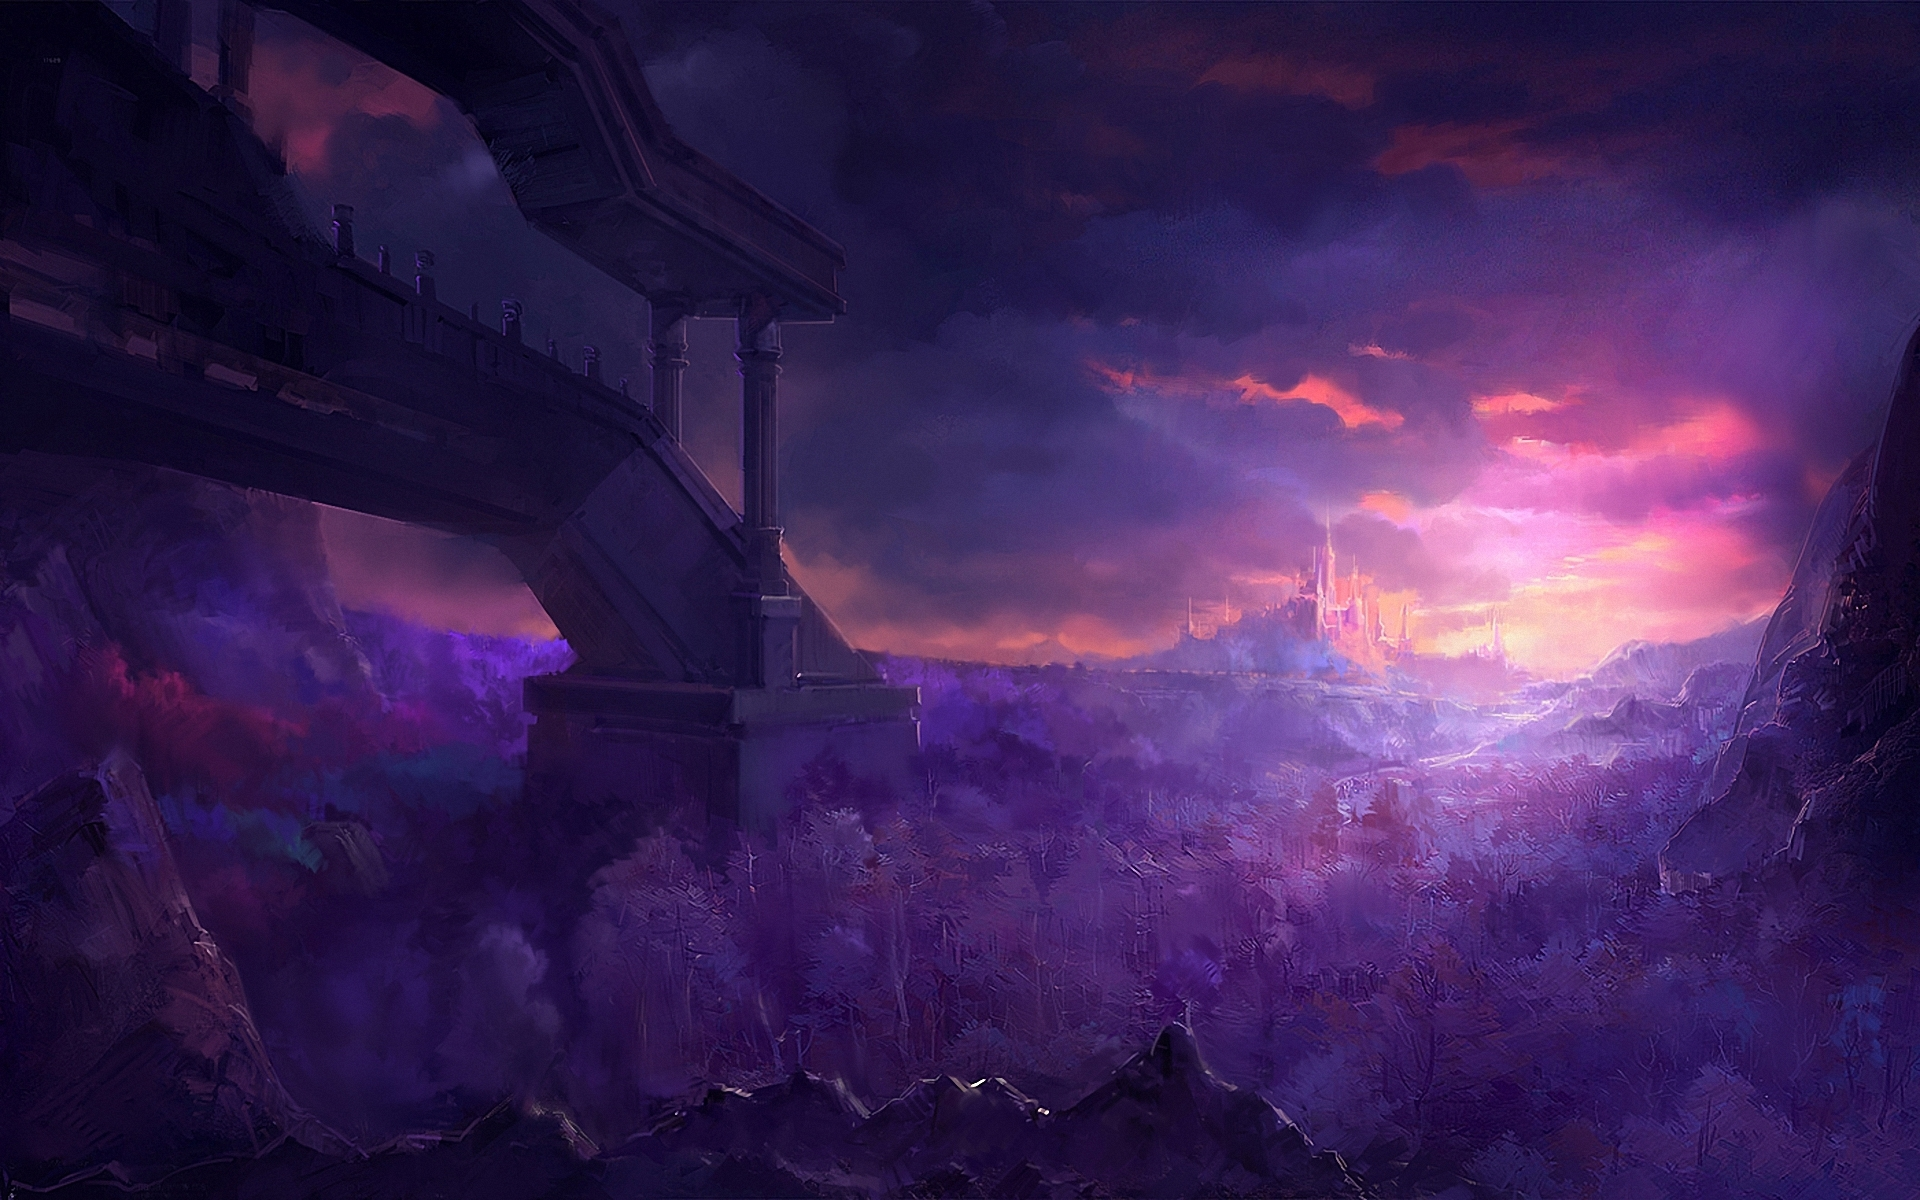 Cool Wallpaper Mountain Fantasy - 8edc78239ab1c1e44796edb08e8a7f87  2018_918485.jpg